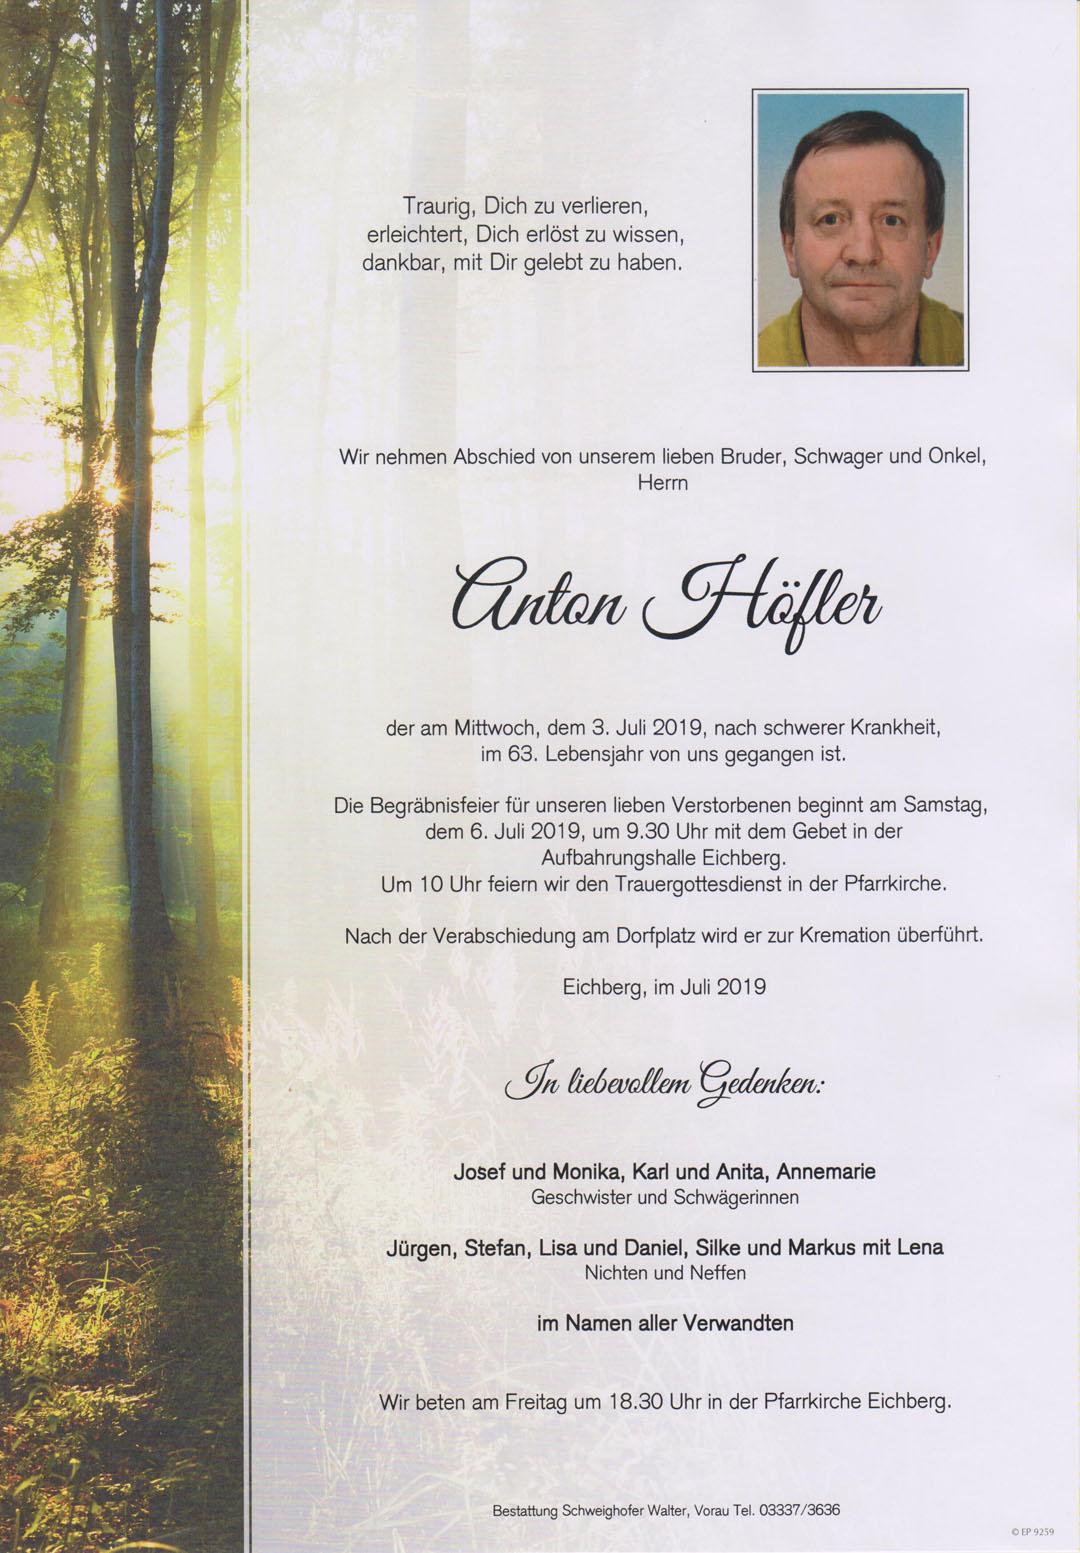 Anton Höfler